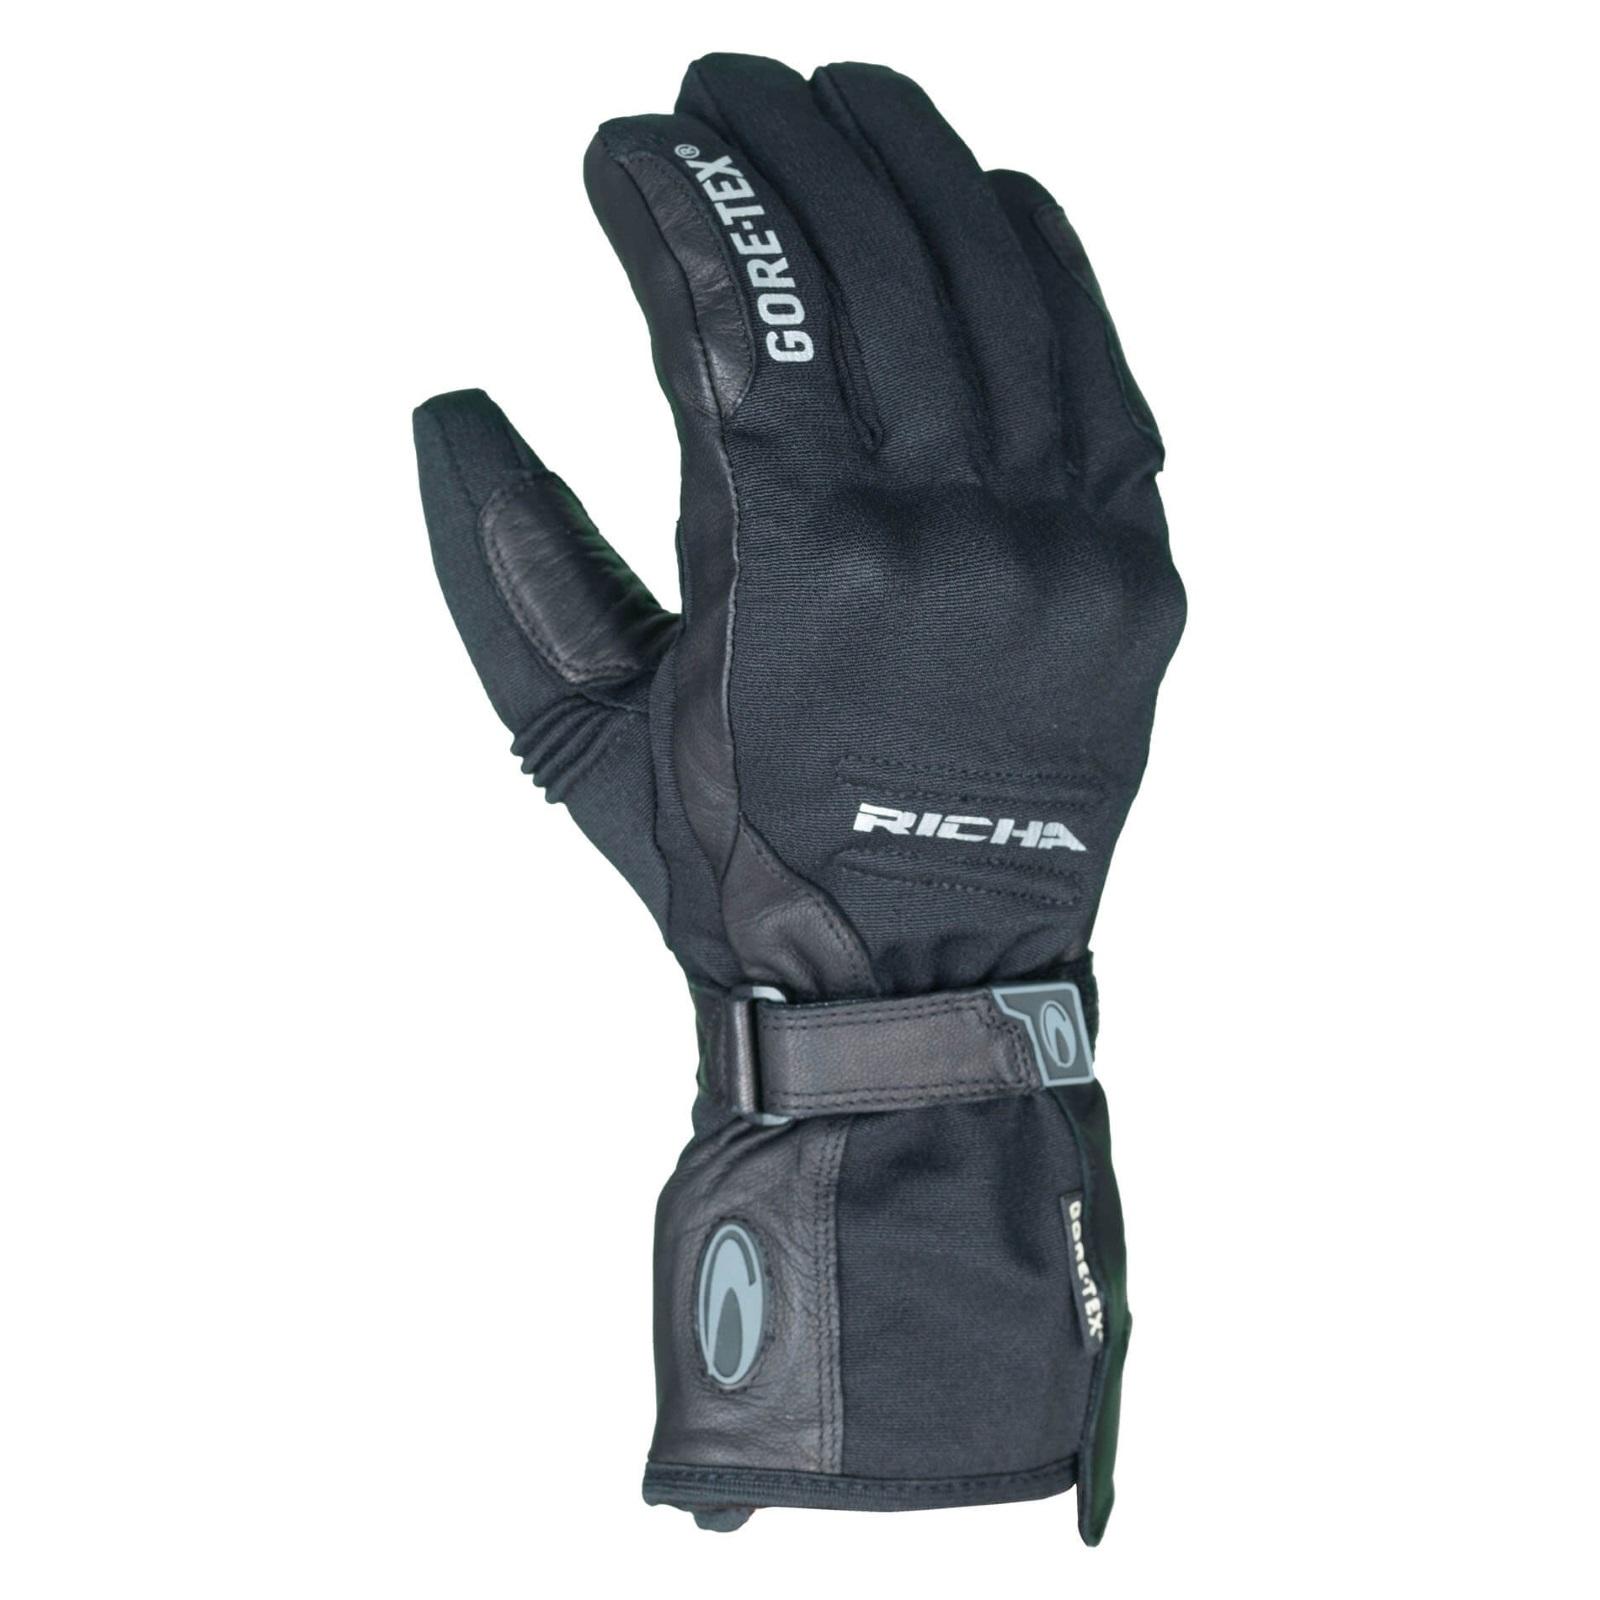 Richa Handschuhe Wind Handschuhe Black-M